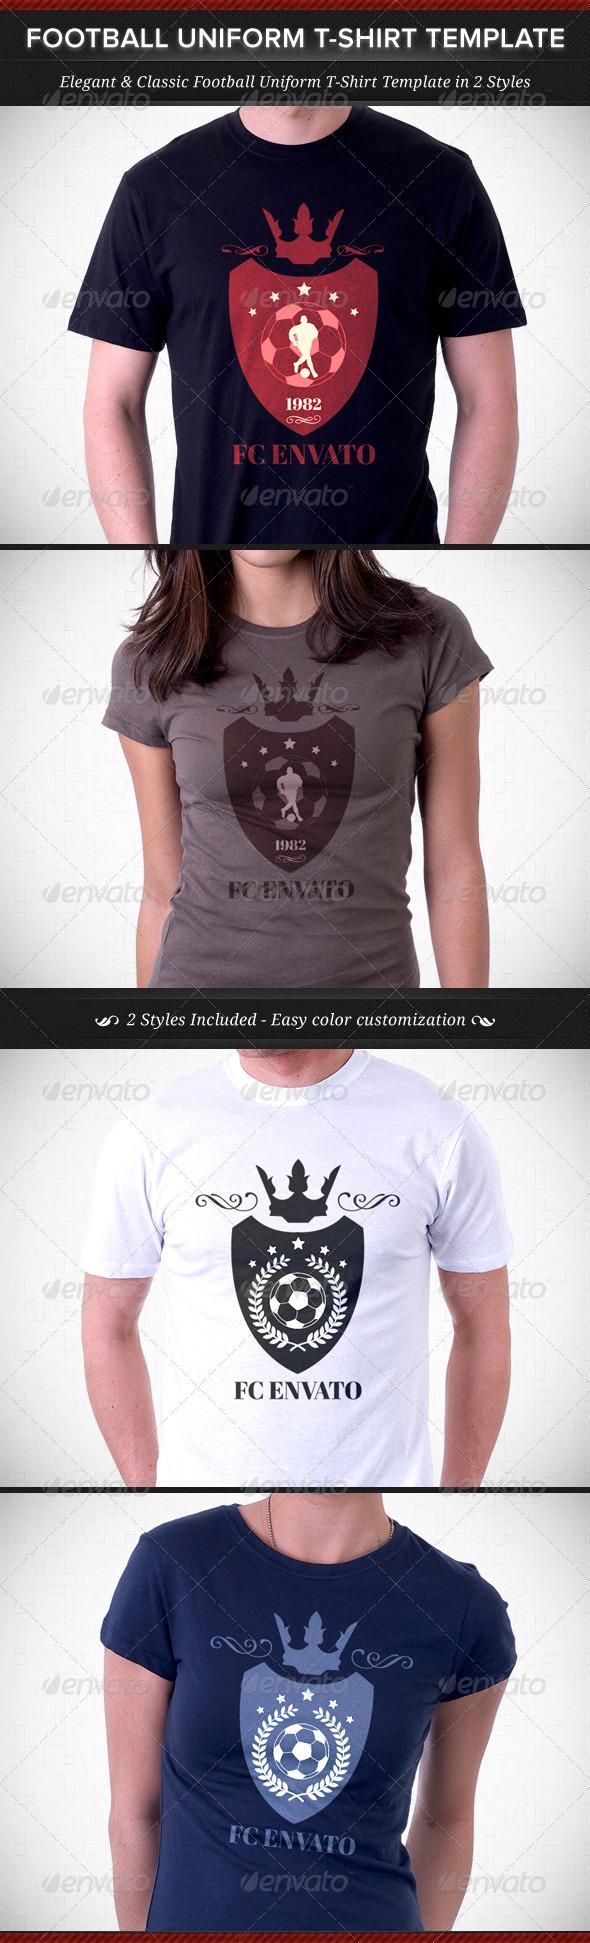 Football Team Uniform T-Shirt Template - Sports & Teams T-Shirts